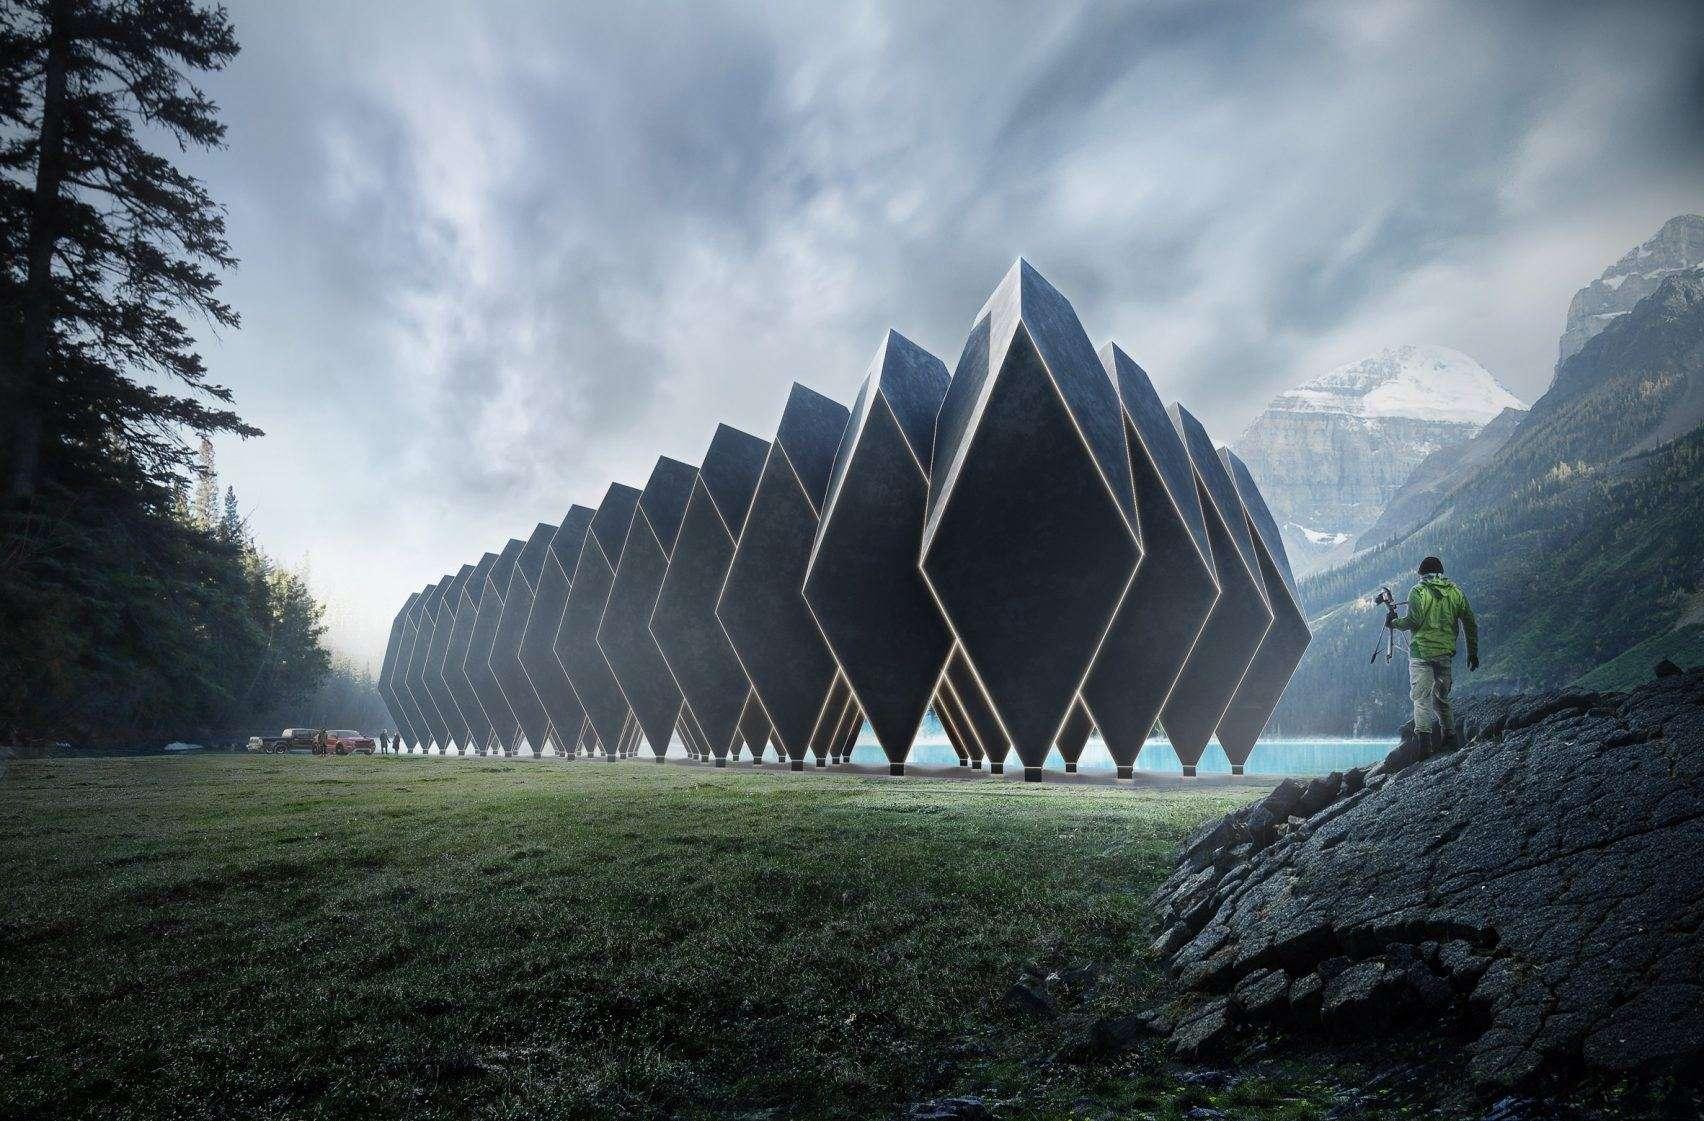 tetra-hotel-wsp-architecture-pod-modular_dezeen_2364_col_2-1704x1121